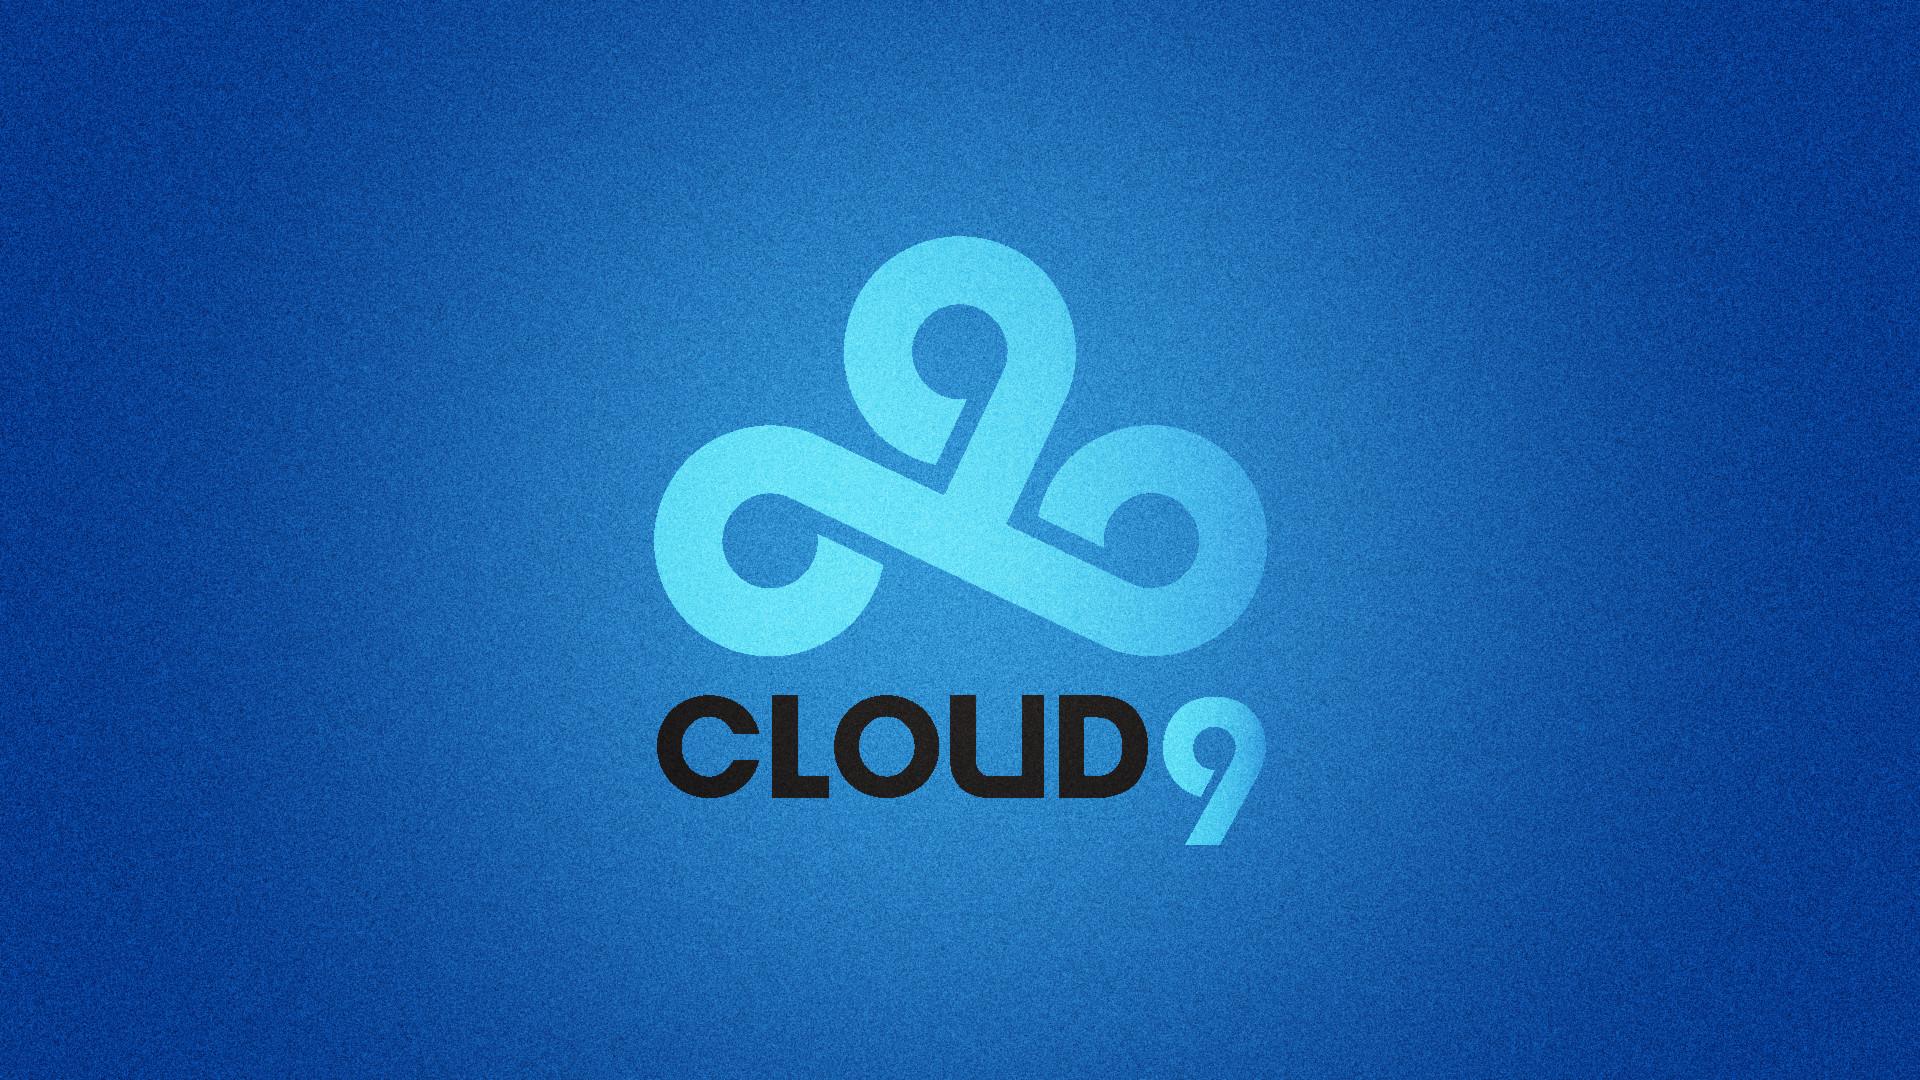 74 Csgo Cloud 9